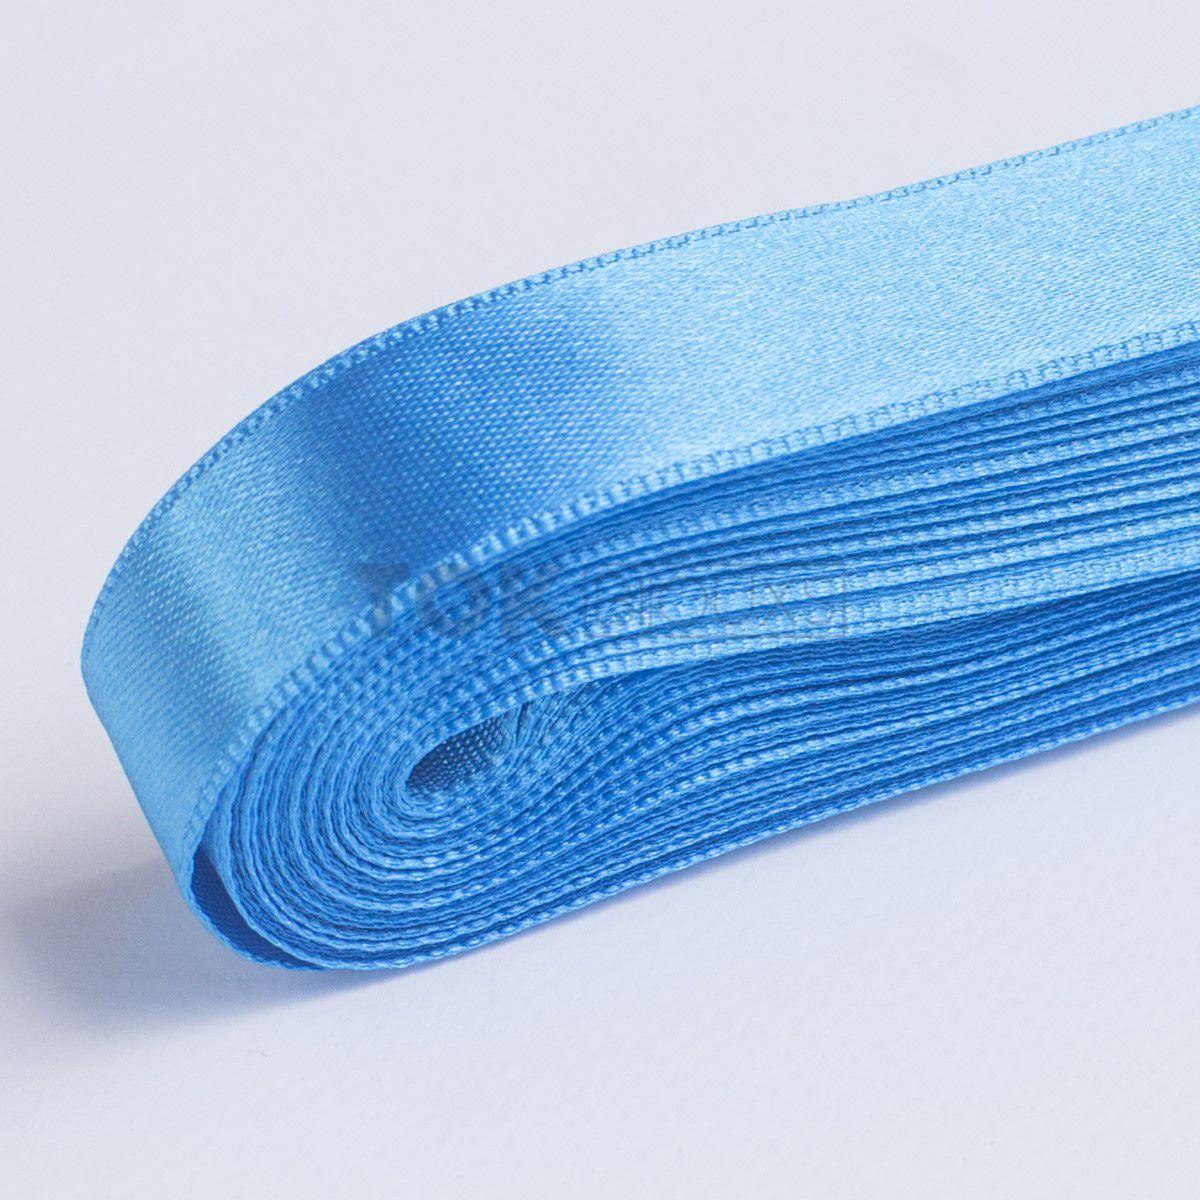 Fita Cetim N.2 - 10mm - 10 Metros - COR (21) Azul Turquesa